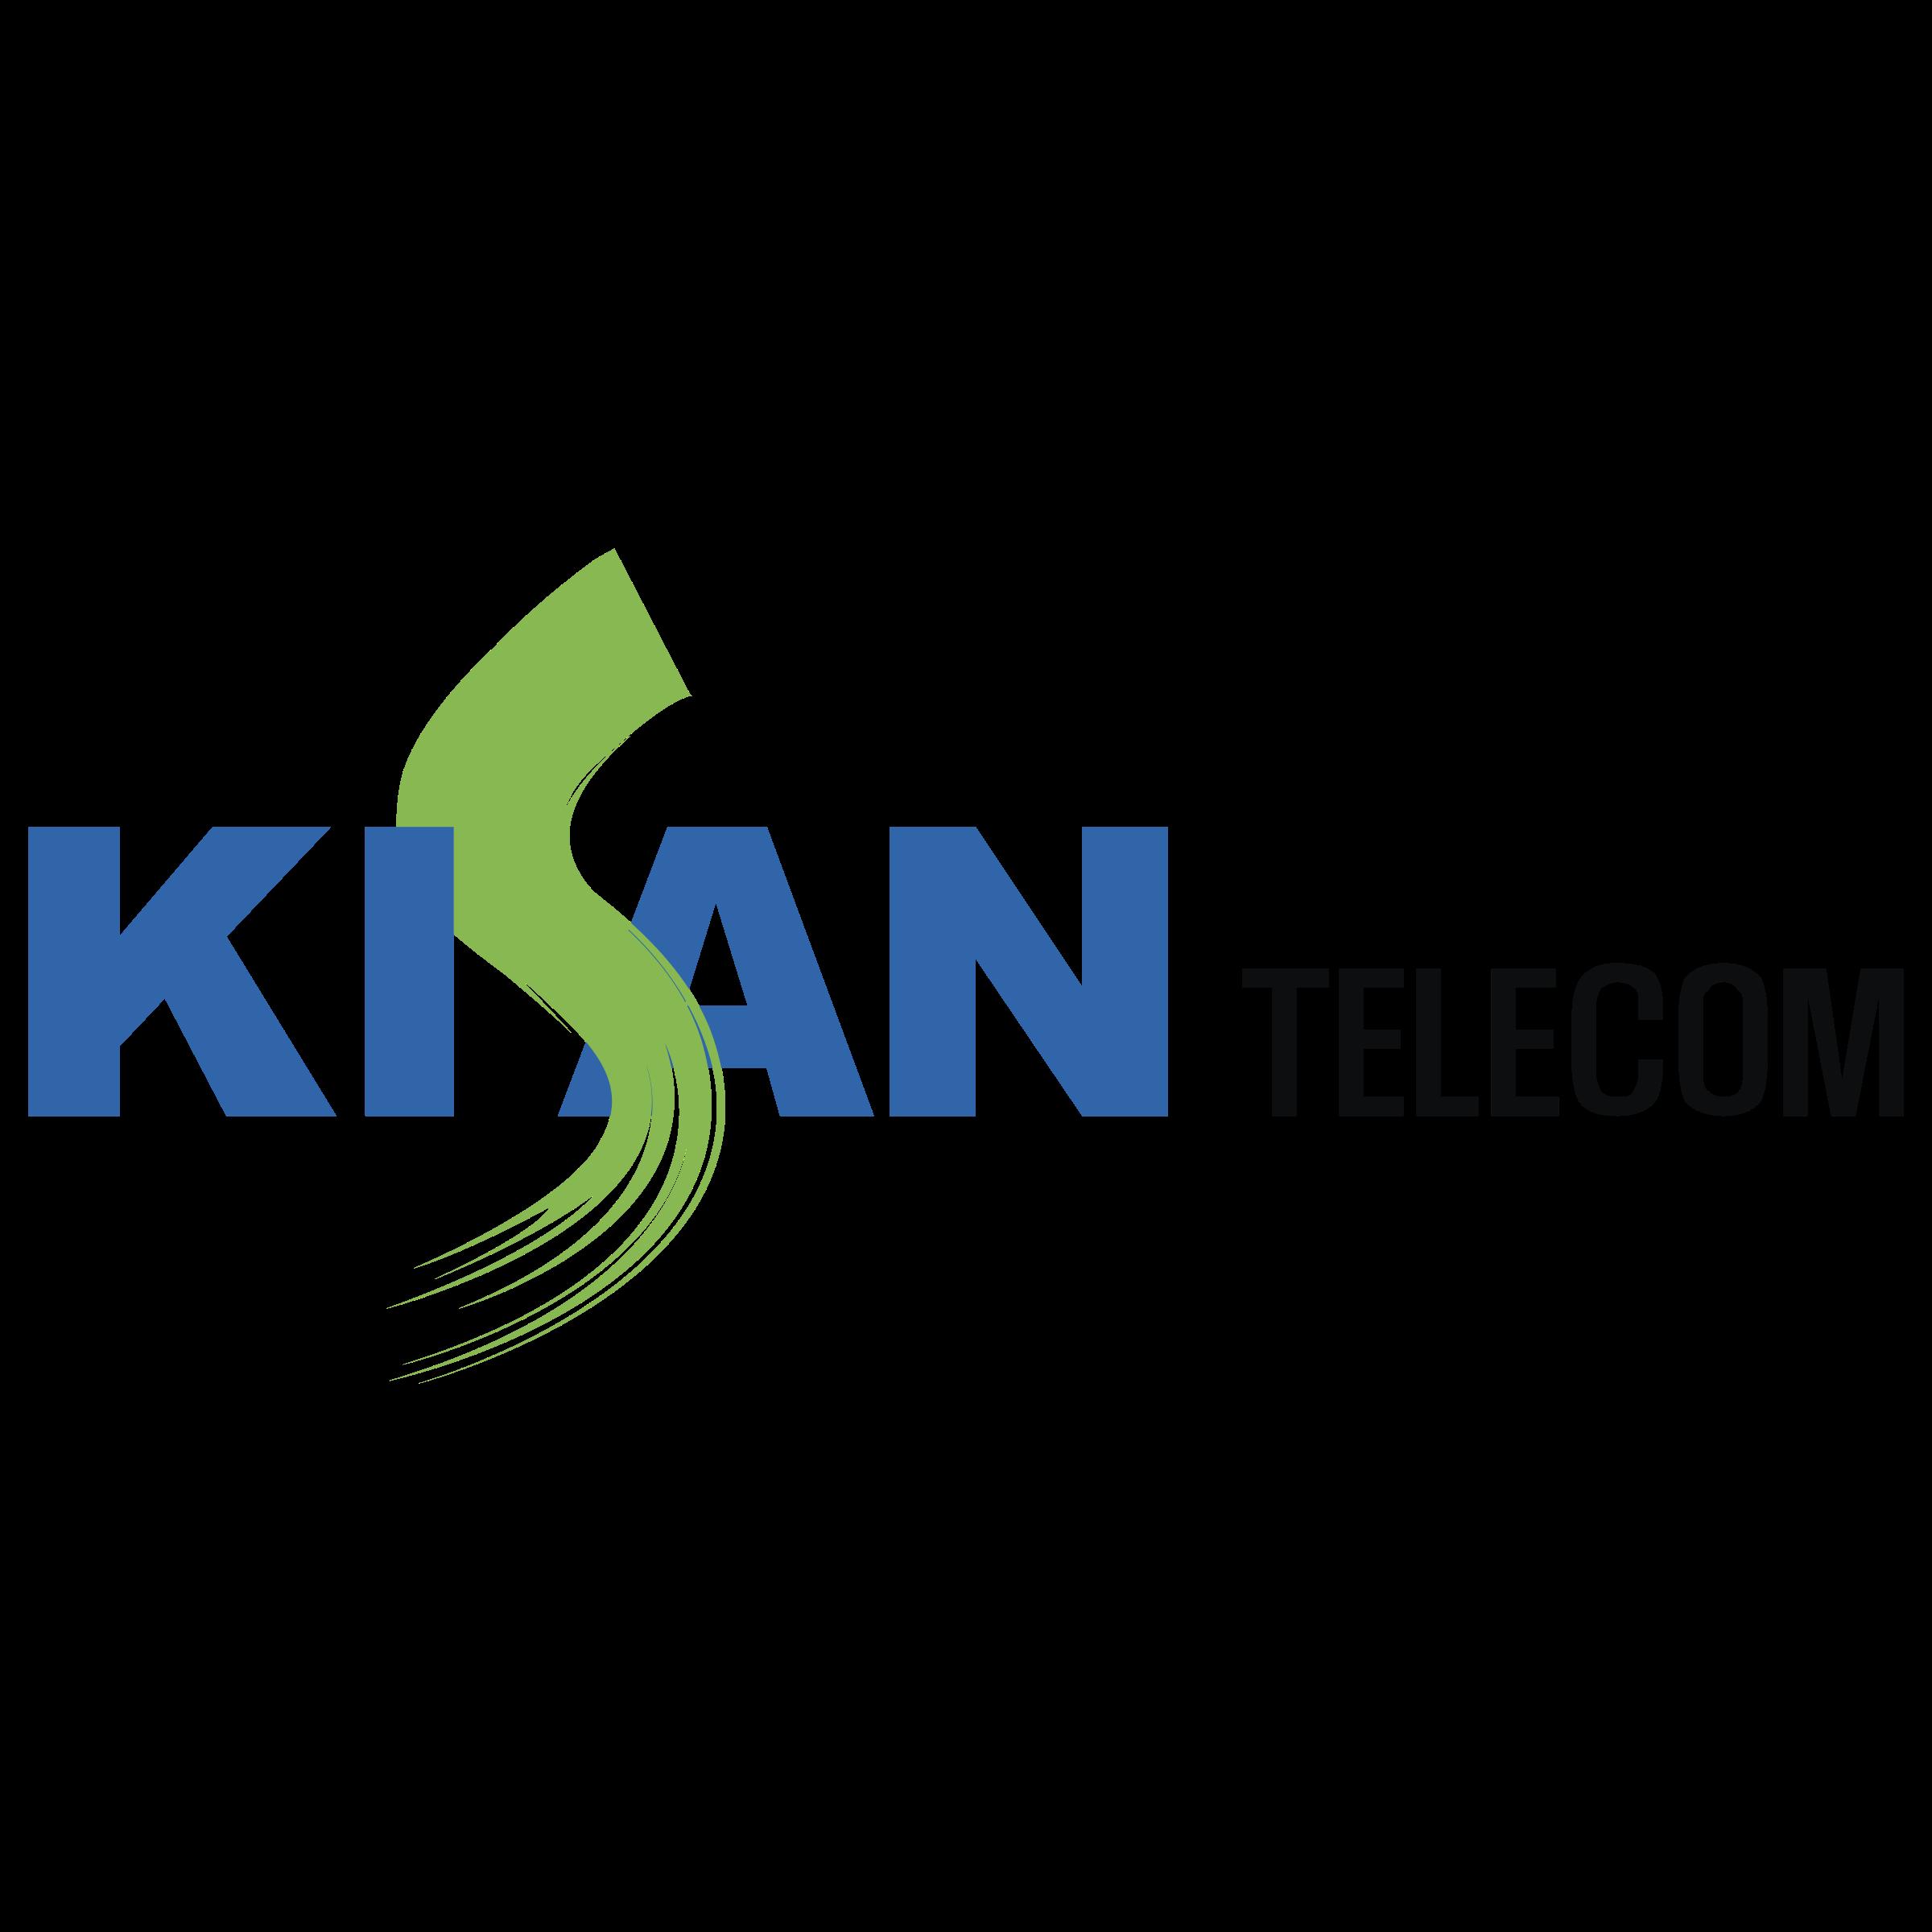 Kisan Telecom Logo PNG Transparent & SVG Vector.